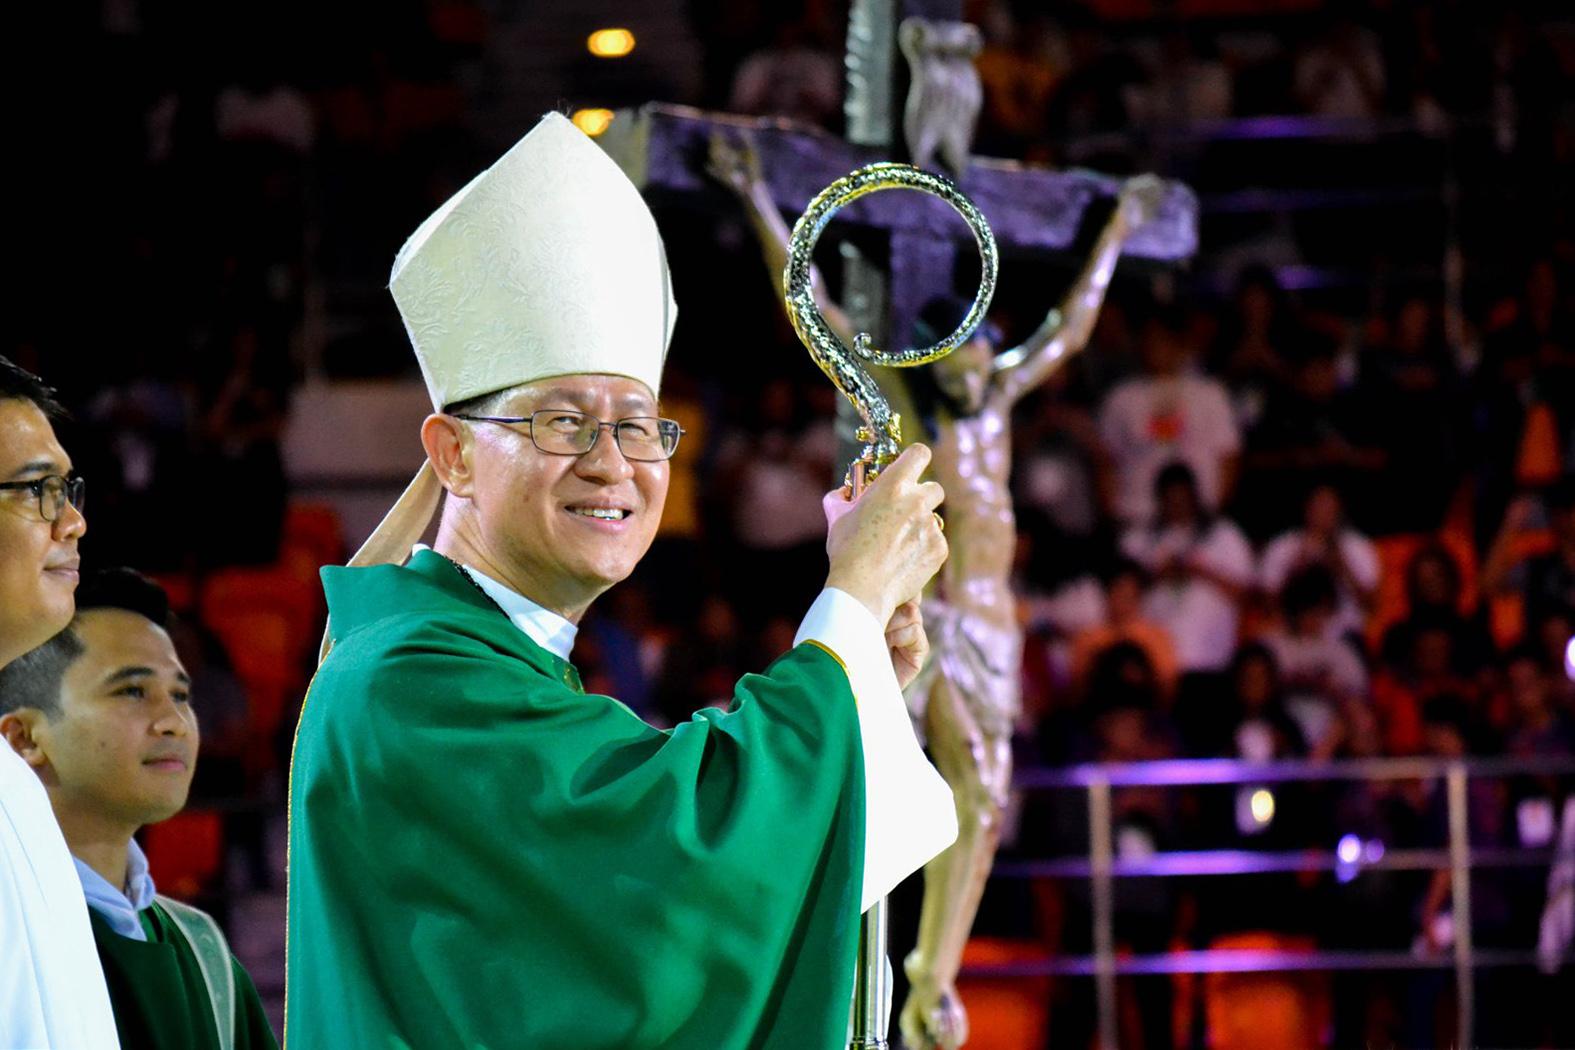 Pope names Tagle as among top-ranking cardinals